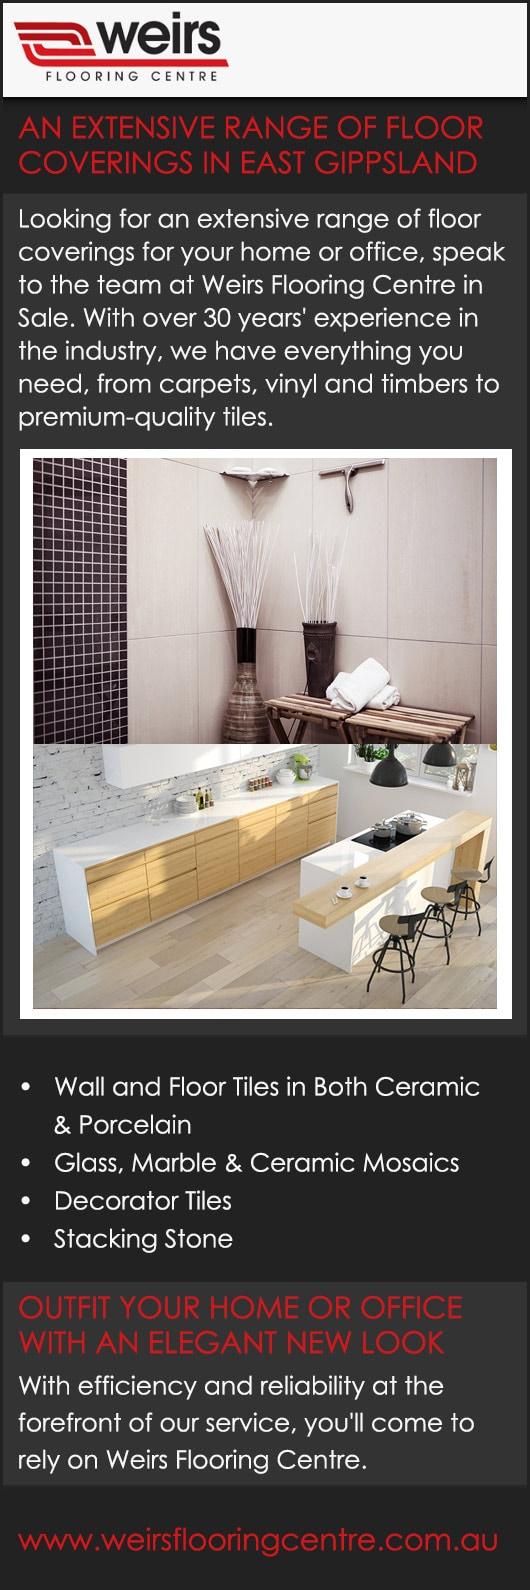 Weirs flooring centre floor tiles wall tiles 274 york st sale weirs flooring centre promotion dailygadgetfo Choice Image